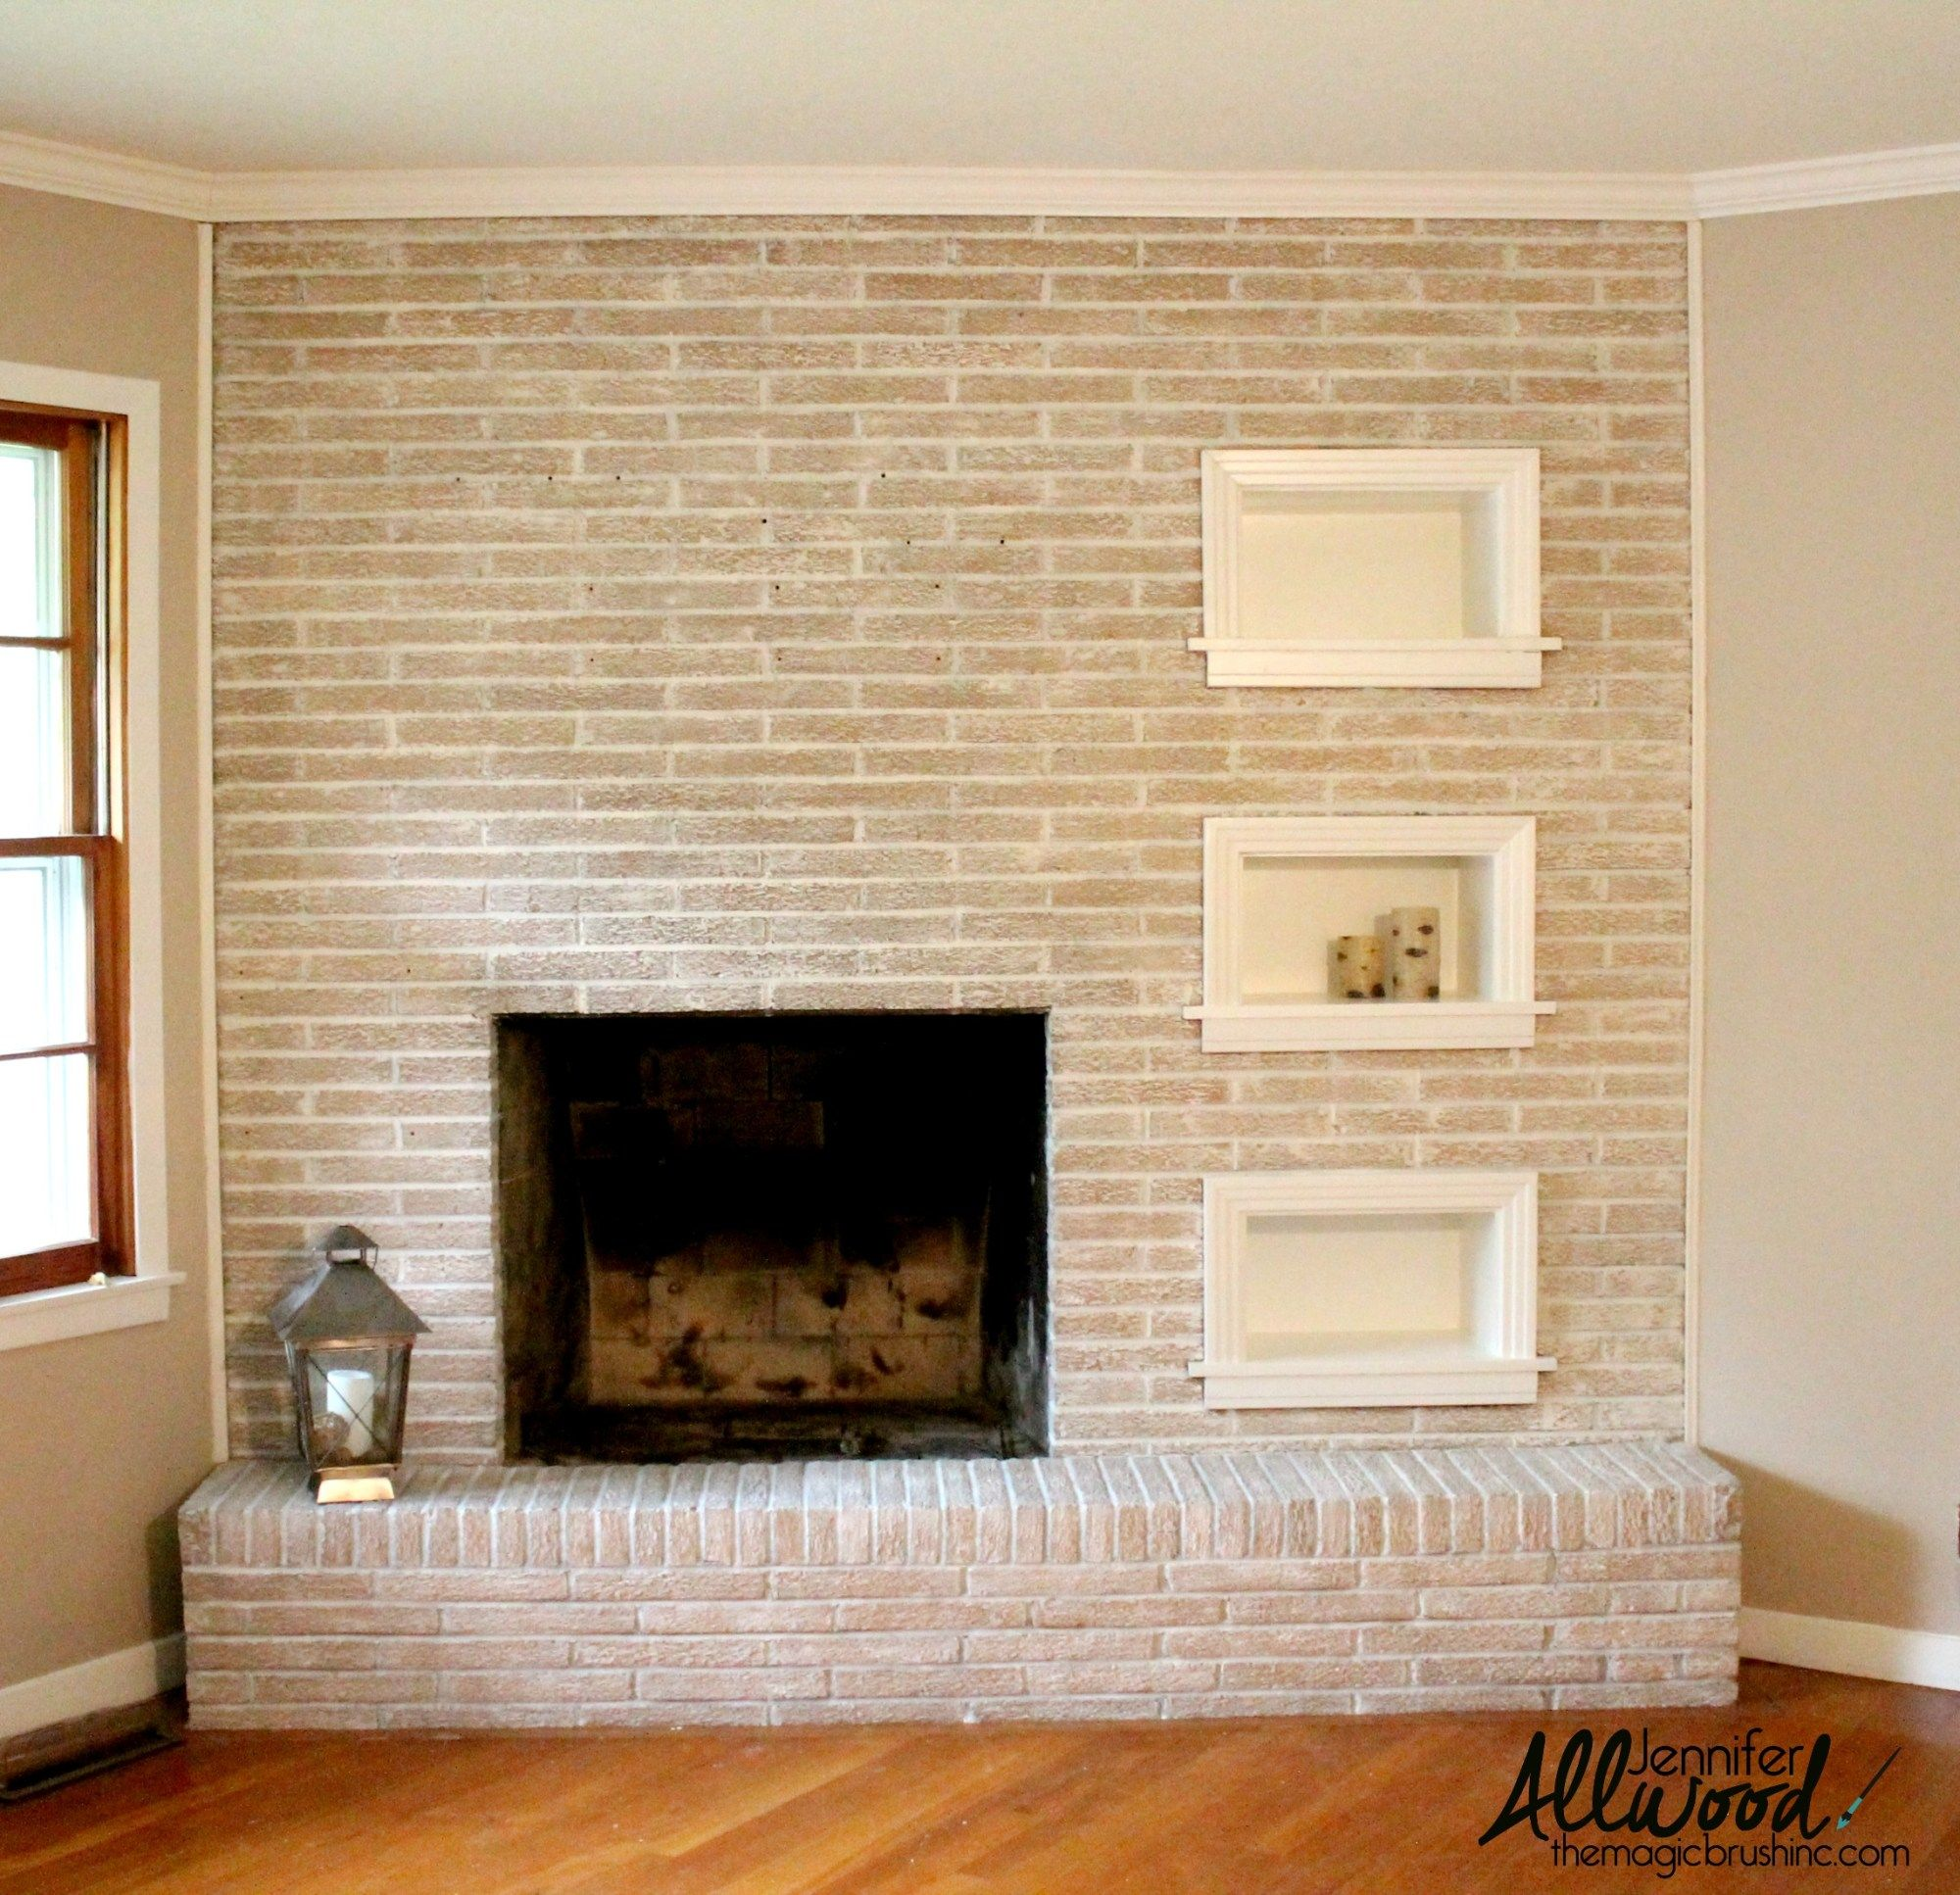 Best Color to Paint Brick Fireplace Unique Paint Fireplace Brick Painting Projects